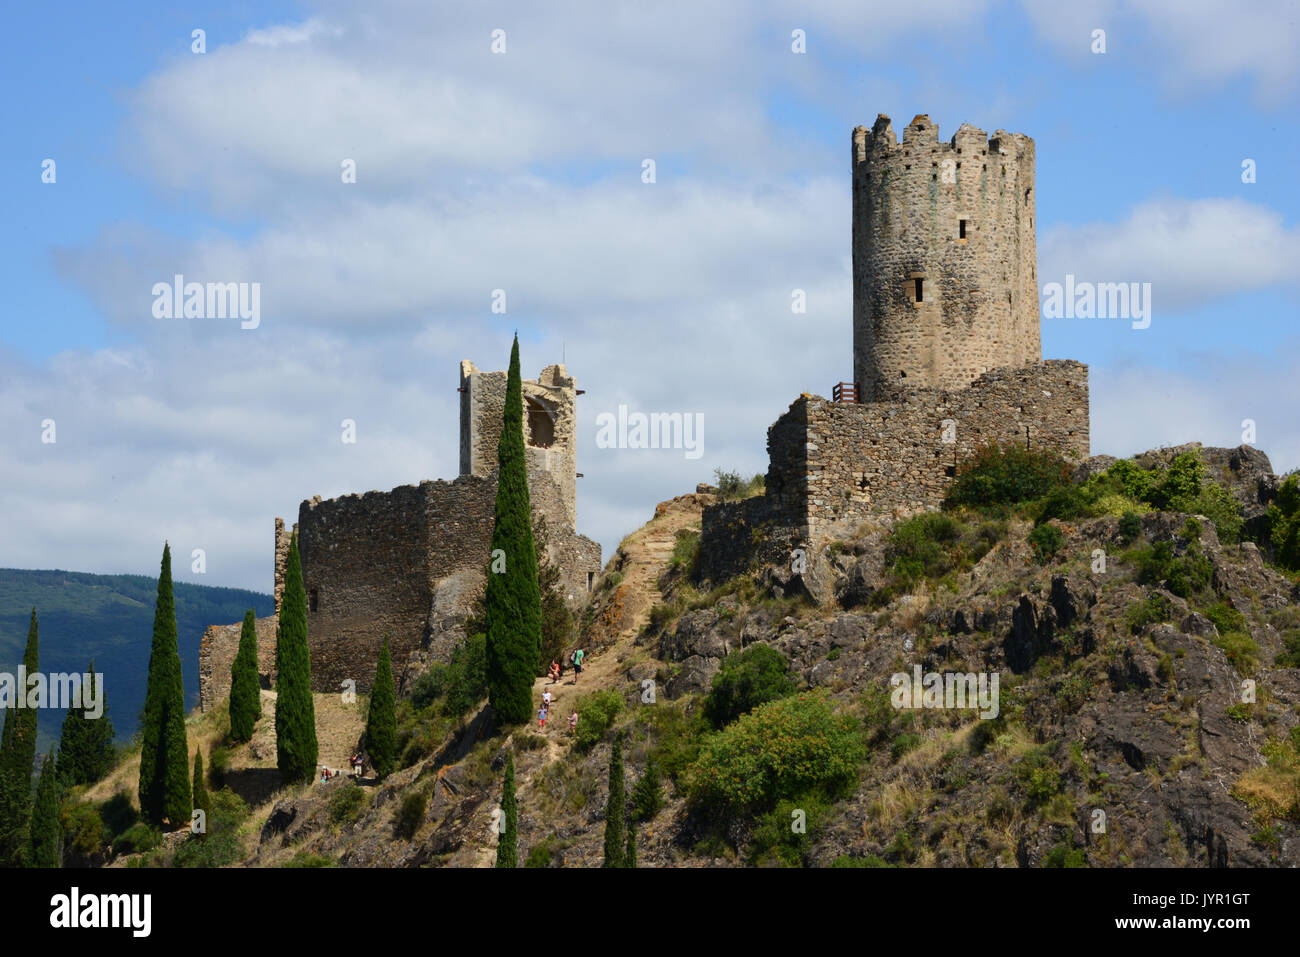 Cathar castles, Lastours, France Stock Photo   Alamy